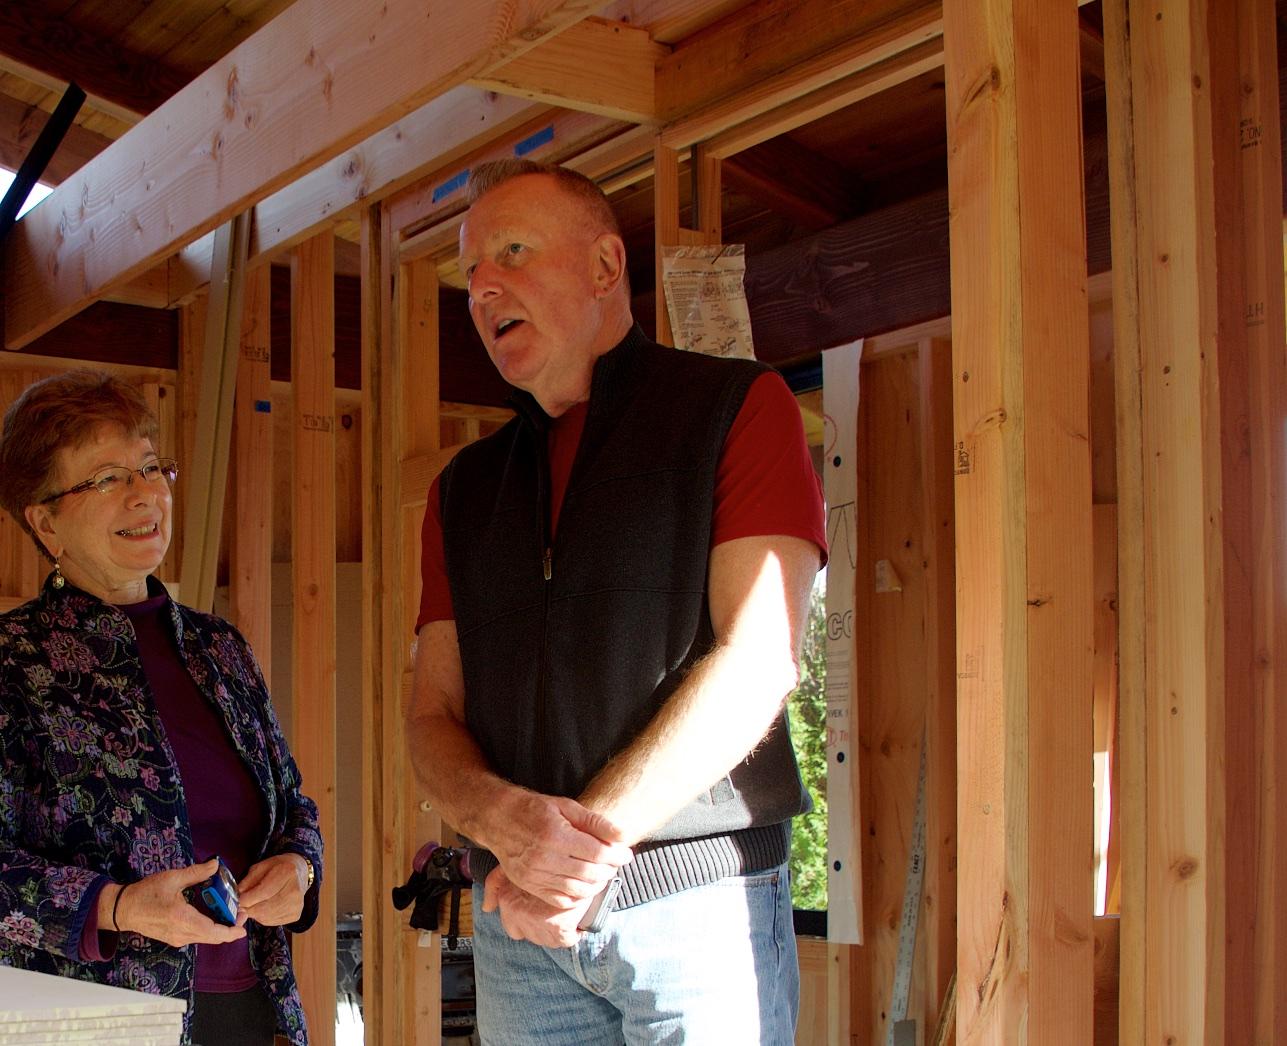 June Moriyasu and Bill Cook discuss design of the tea house.